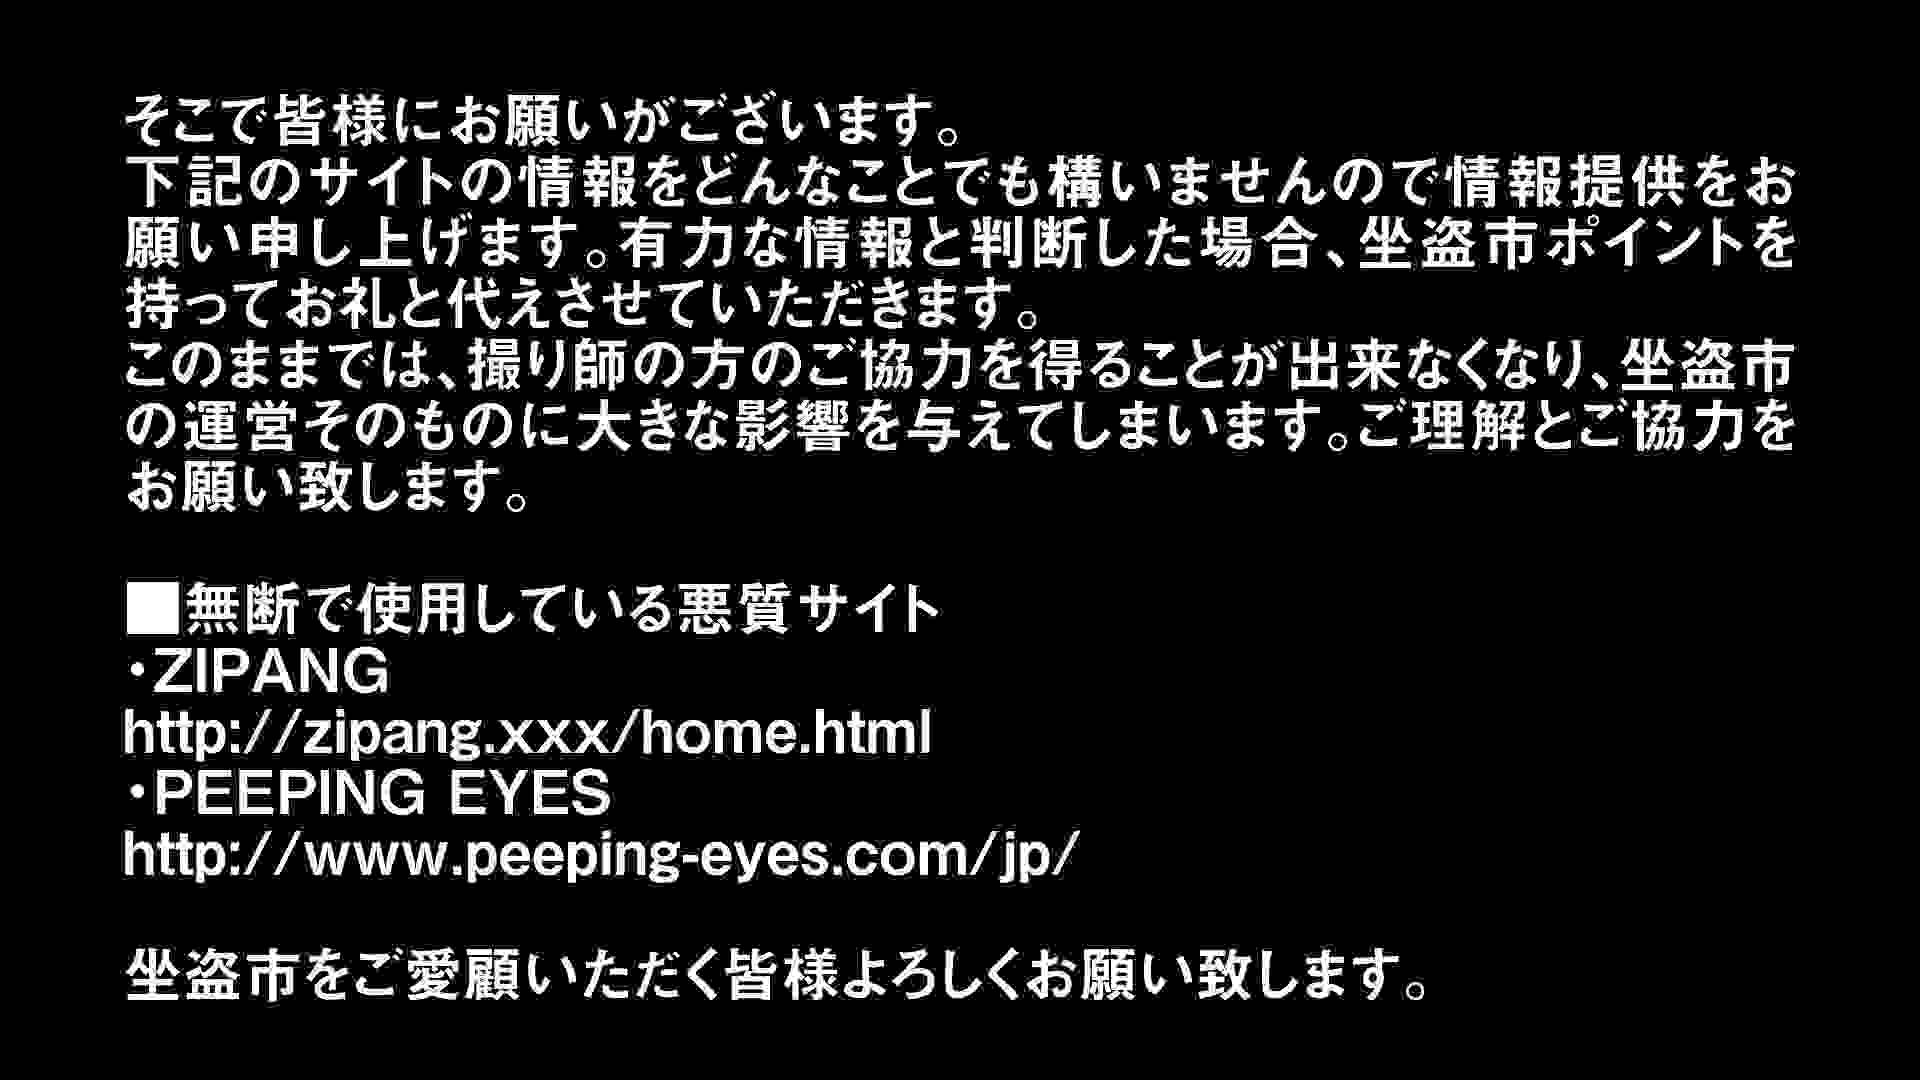 Aquaな露天風呂Vol.301 OLのエロ生活 すけべAV動画紹介 112連発 35